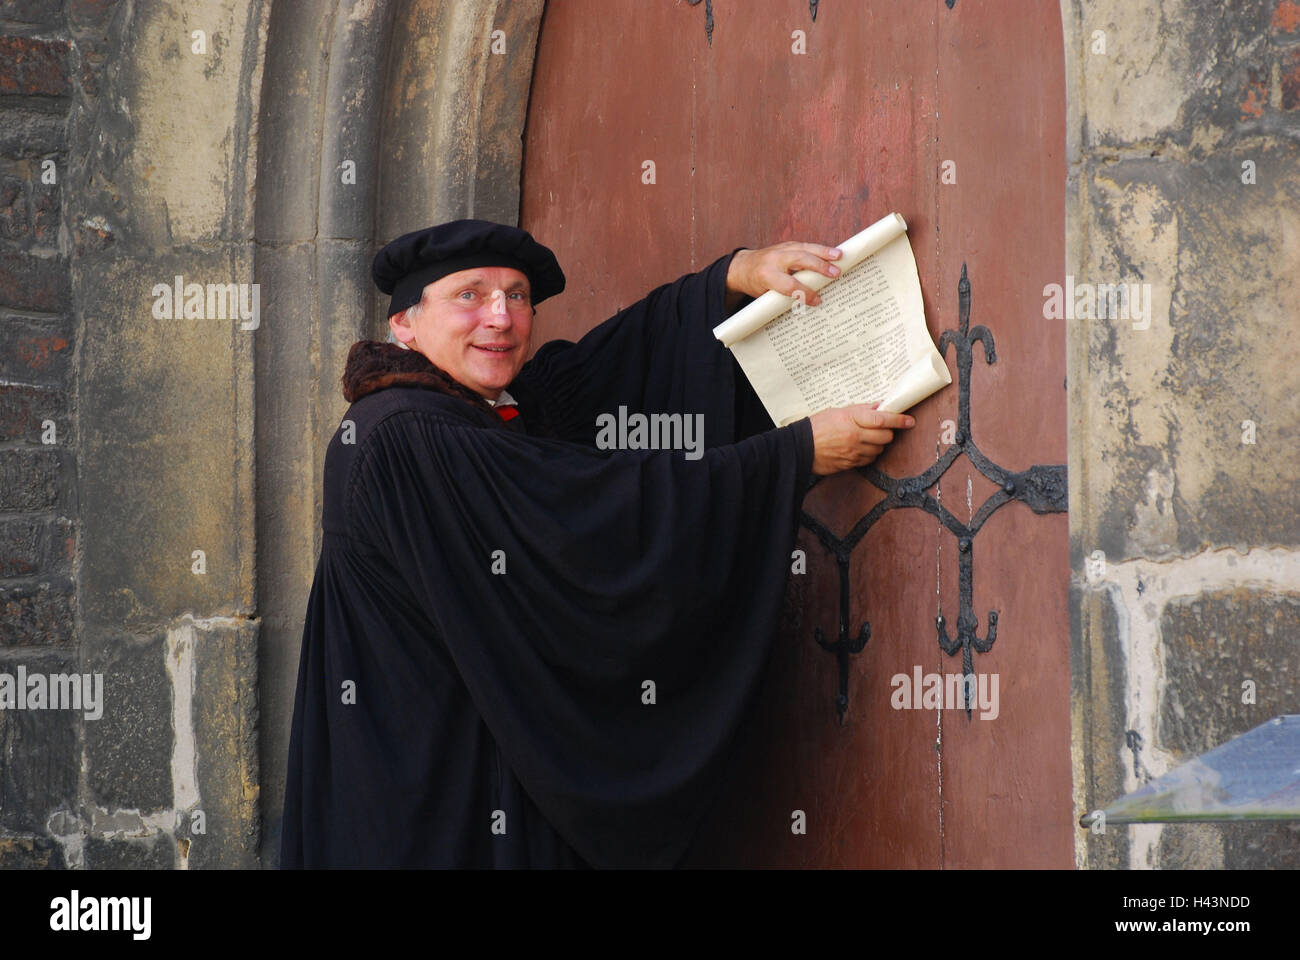 Decorating martin luther church door photos : Actor Martin Luther Church Door Stockfotos & Actor Martin Luther ...